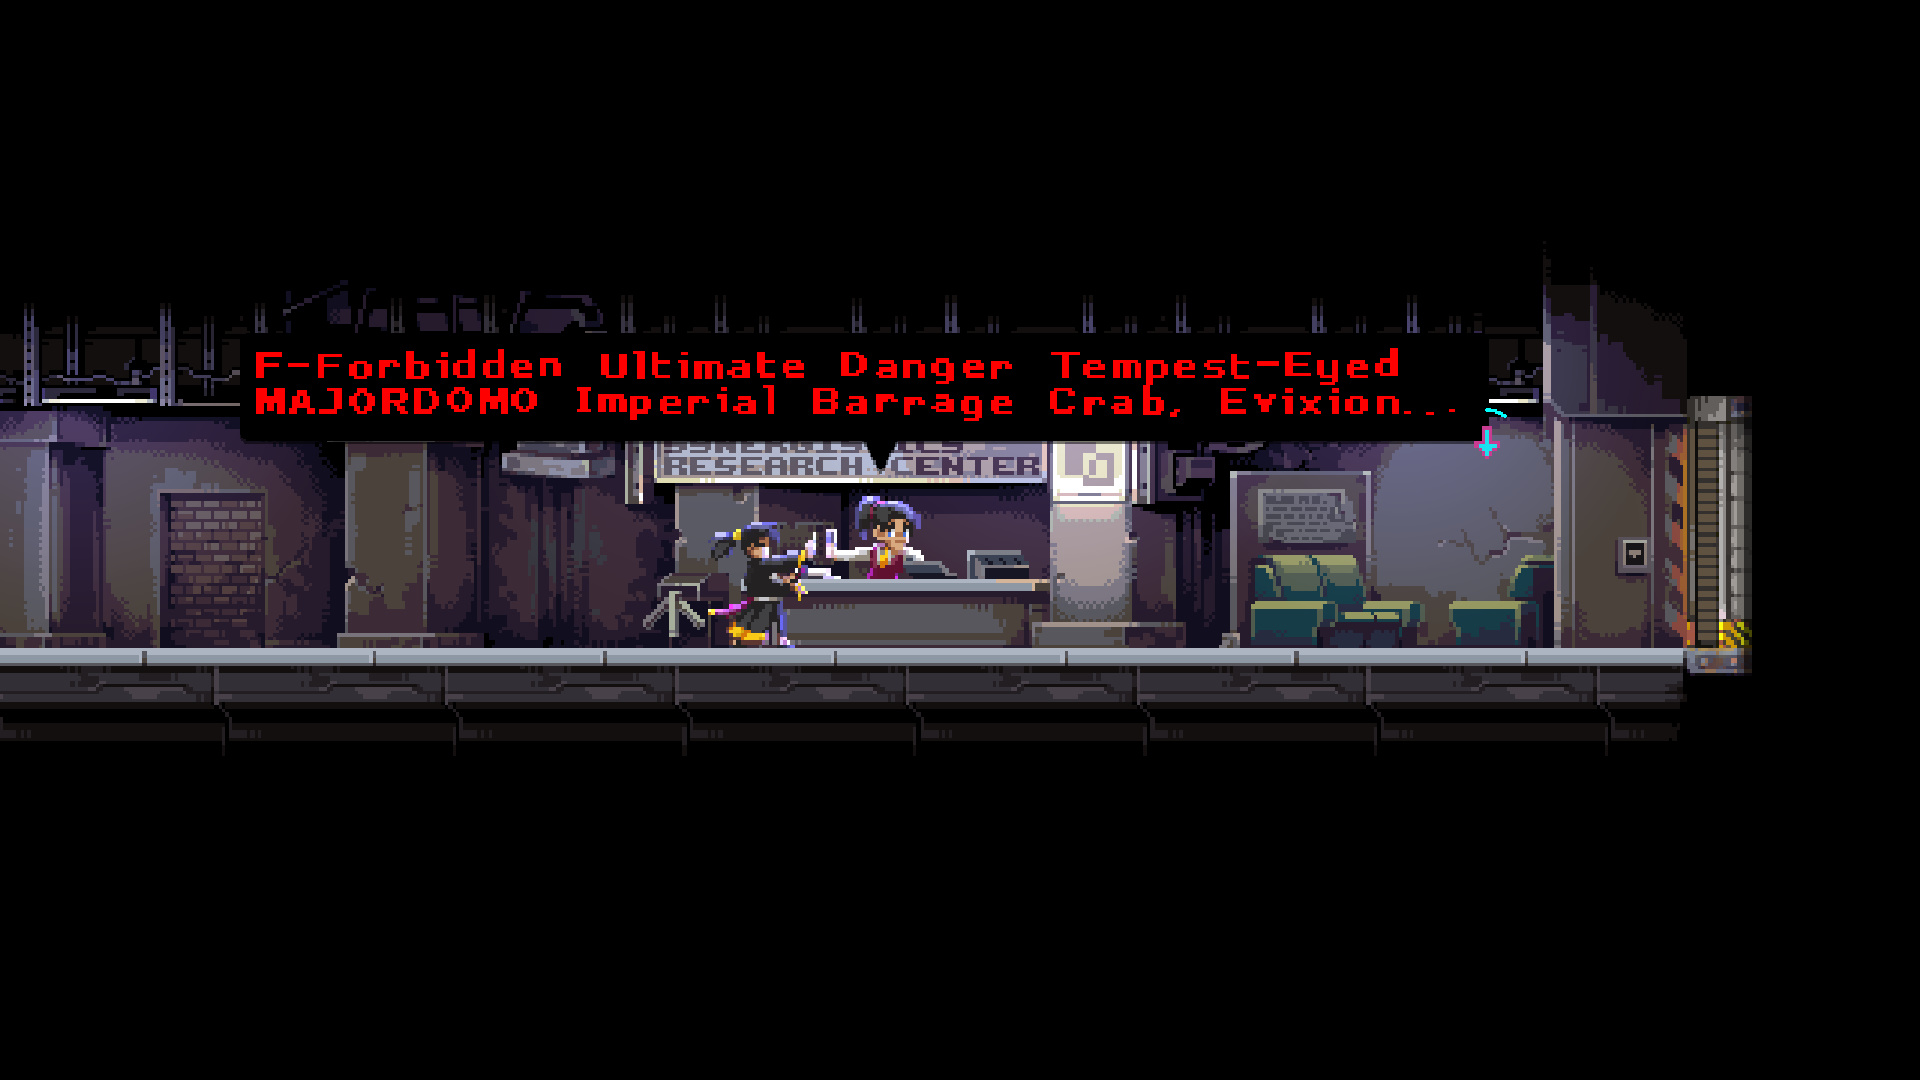 Achievement Forbidden Ultimate Danger Tempest-Eyed MAJORDOMO Imperial Barrage Crab, Evixion (Hotel & Bunker)